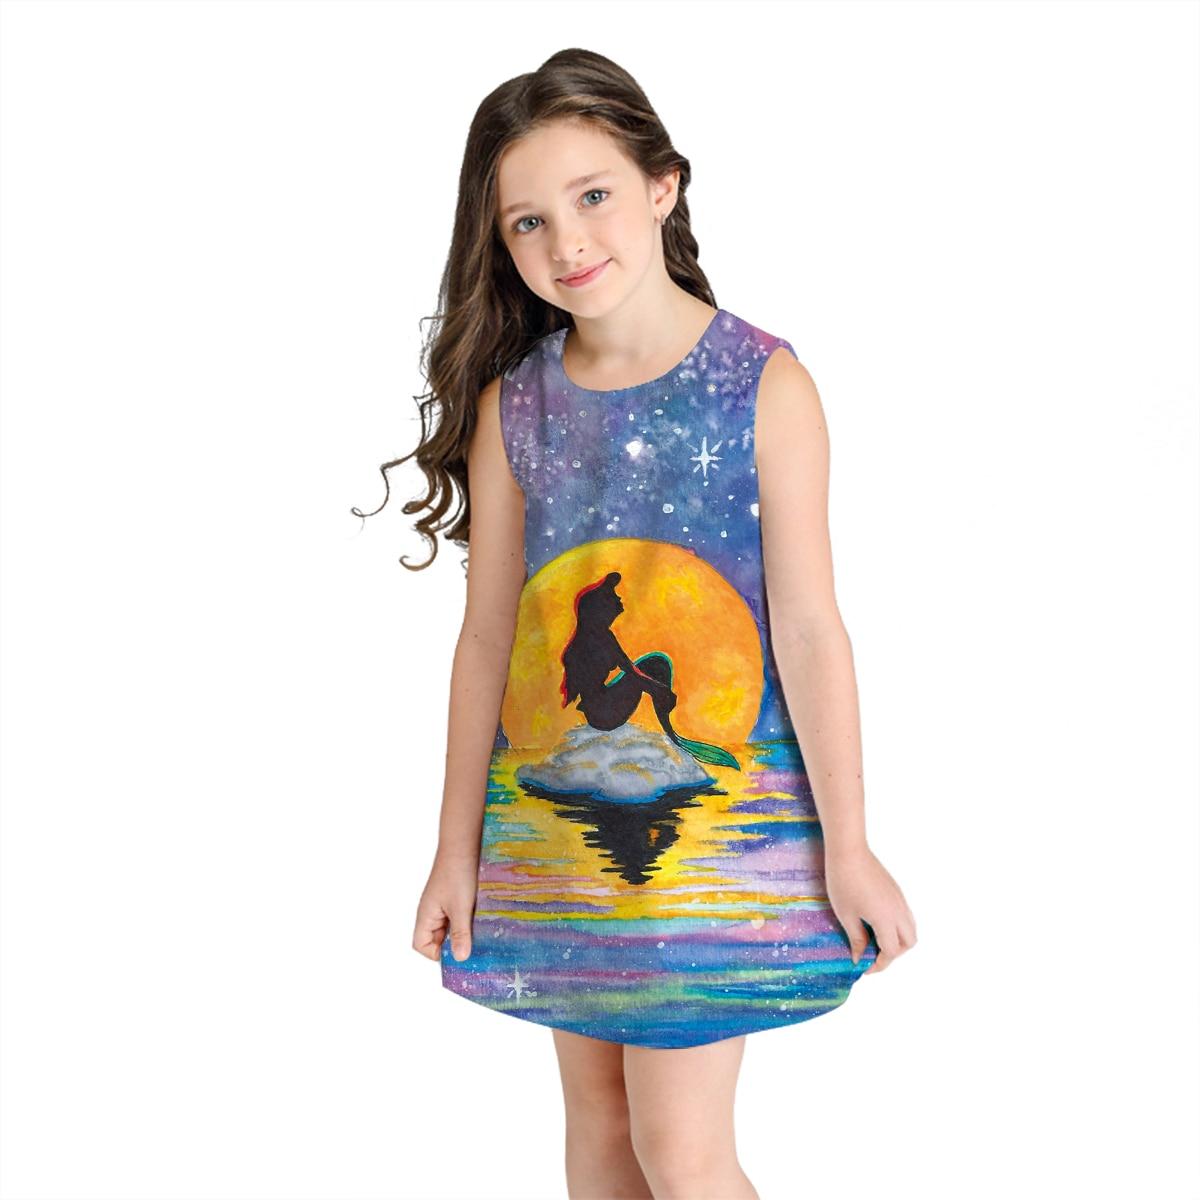 b0b16eaea210 Raisevern Sleeveless Dresses Girls 3D Digital Little Mermaid Summer Kids  A-line Star Moon Printing